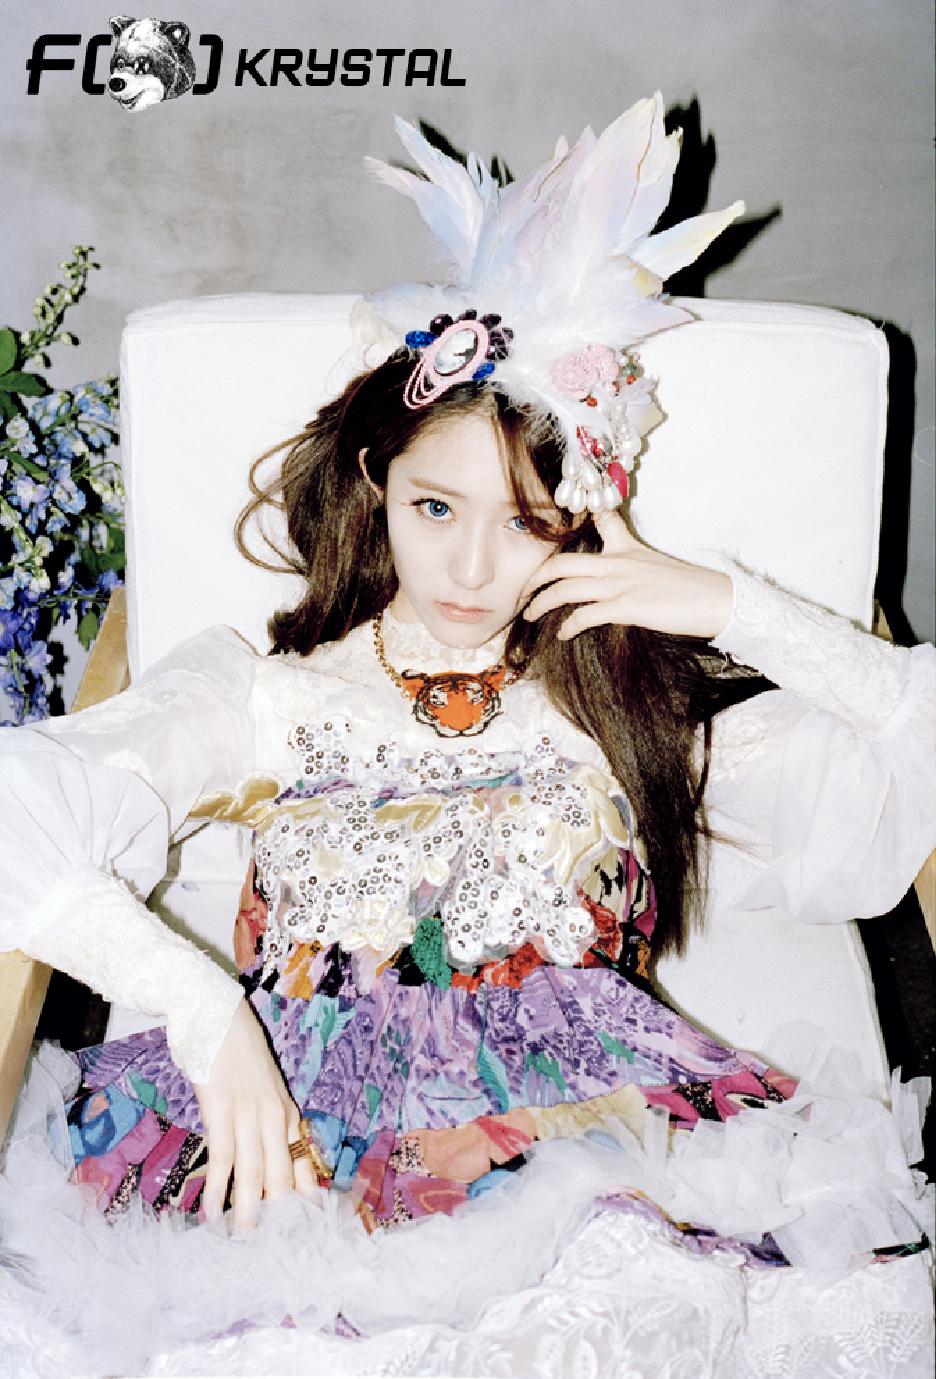 F(x) Electric Shock Krystal teaser photo.png